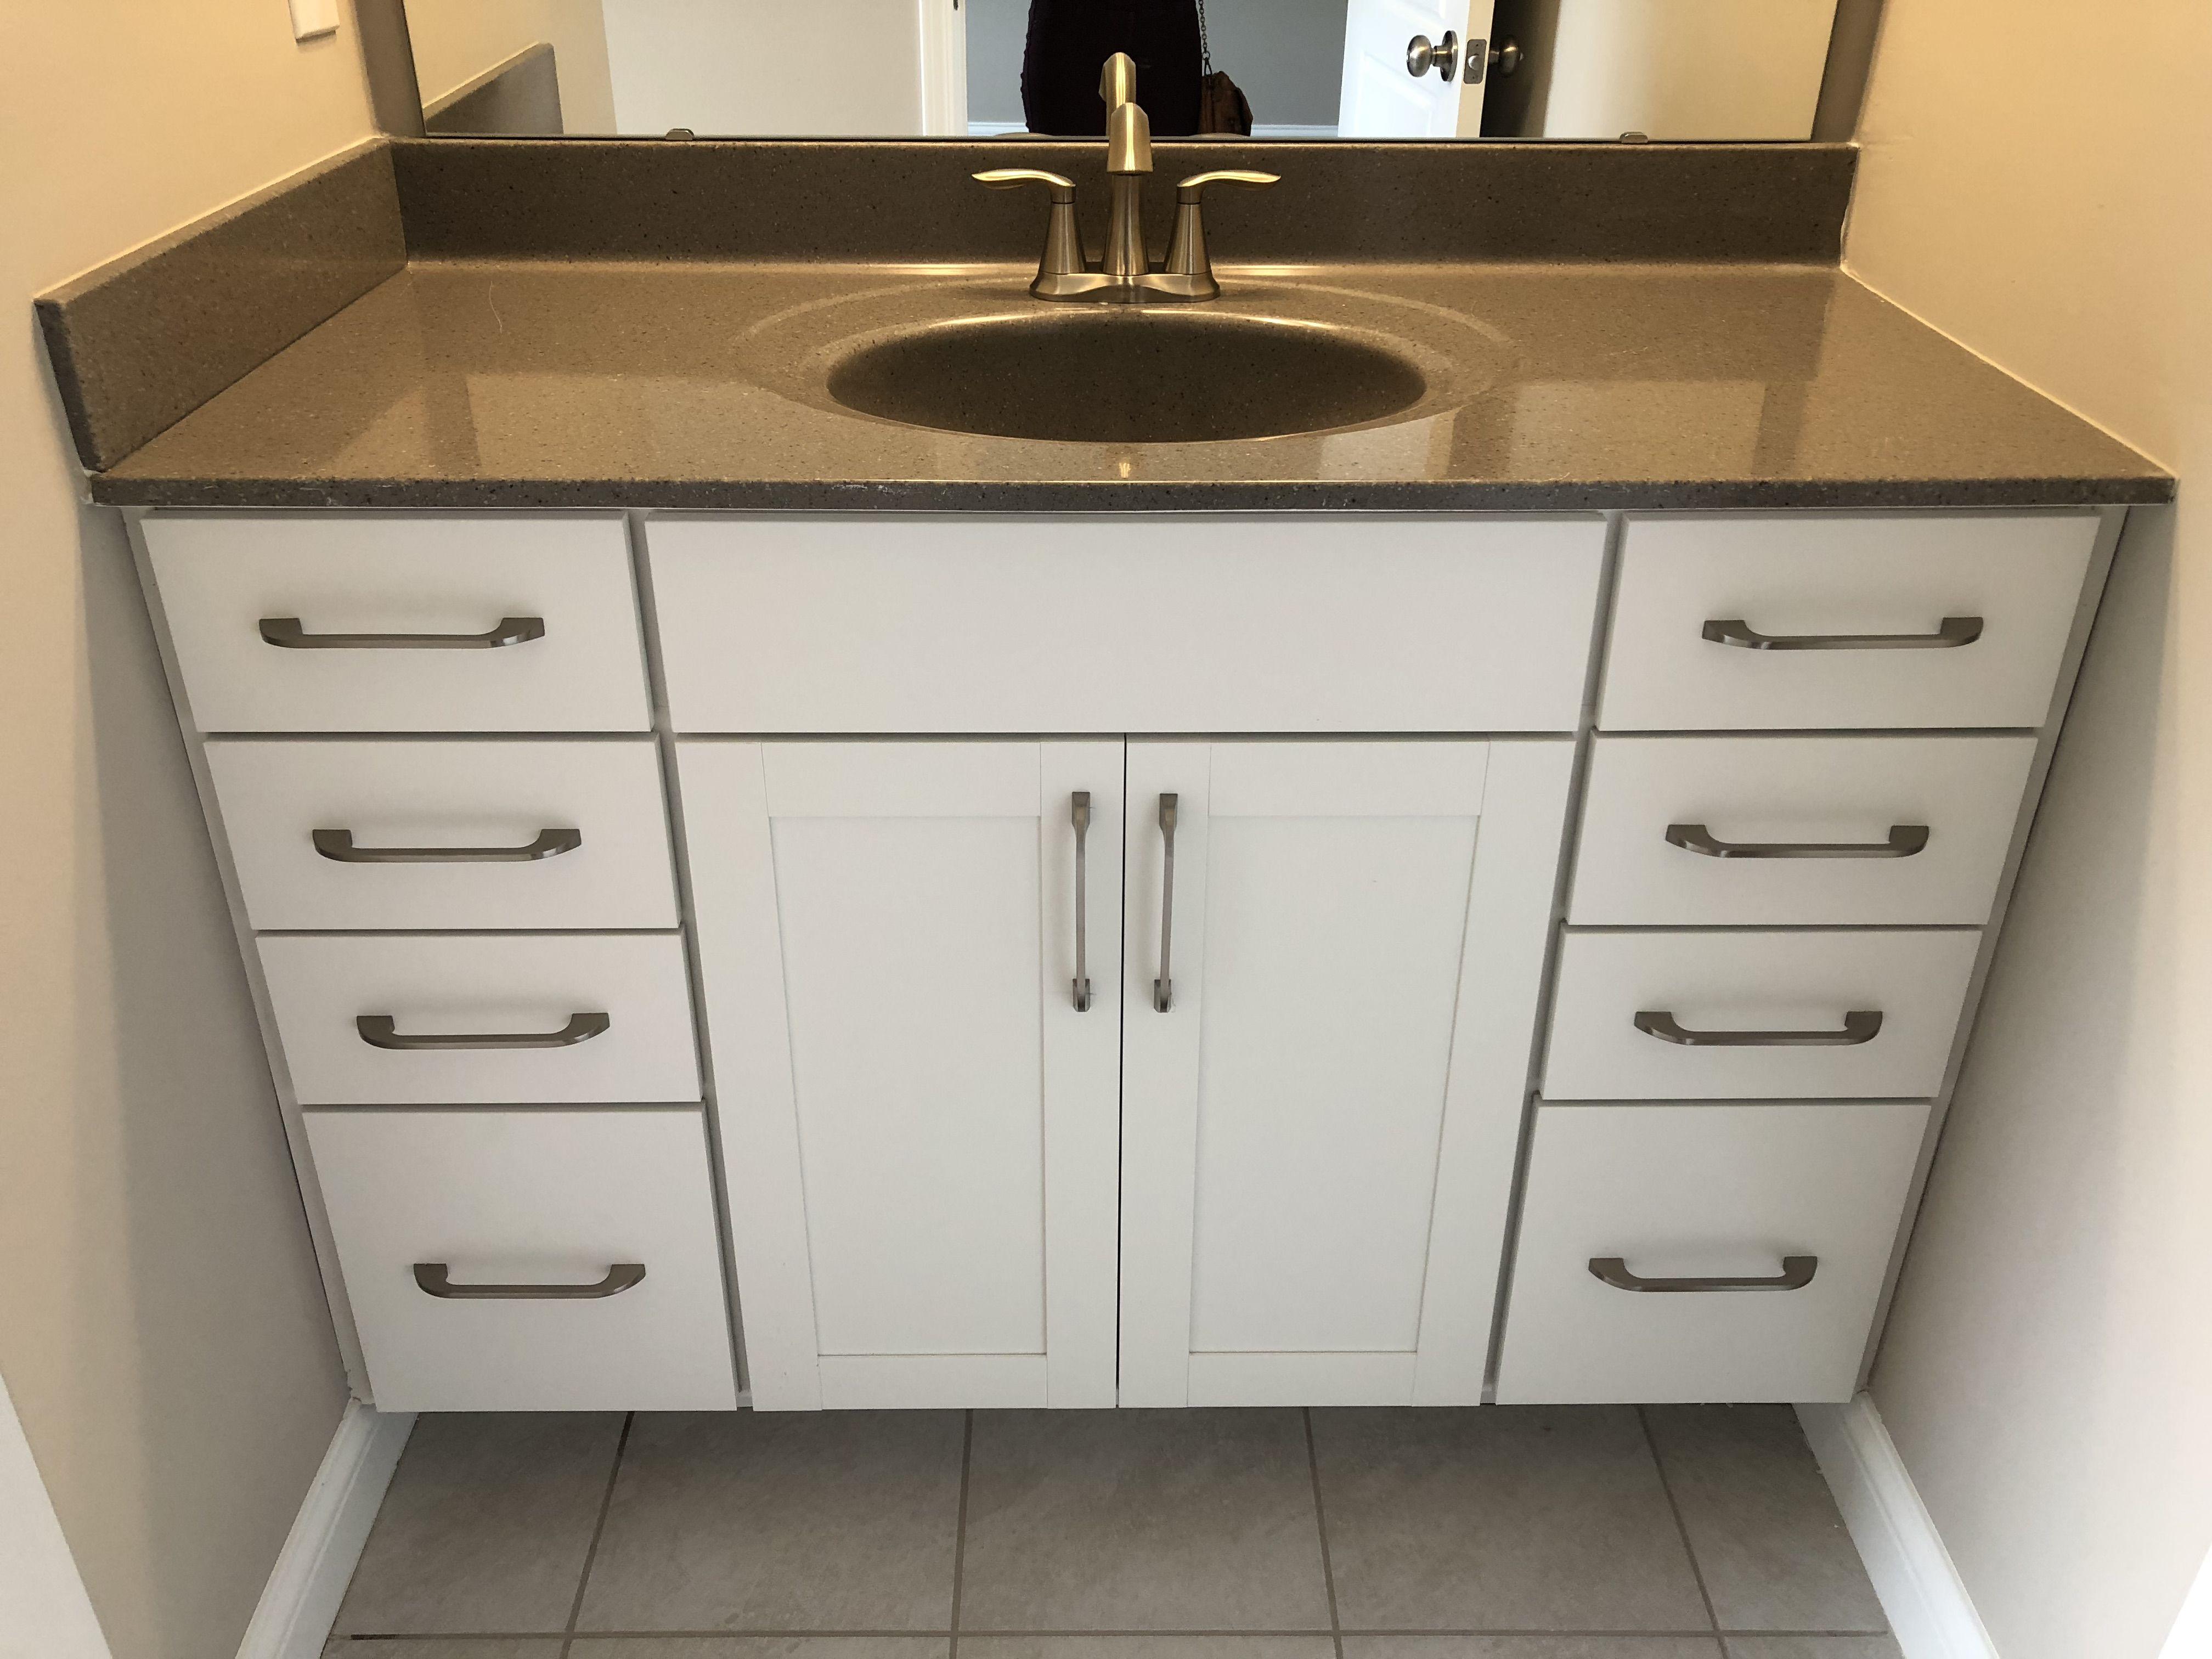 Brellin White Bath Vanity Cabinets Vanity Cabinet Vanity White Bath